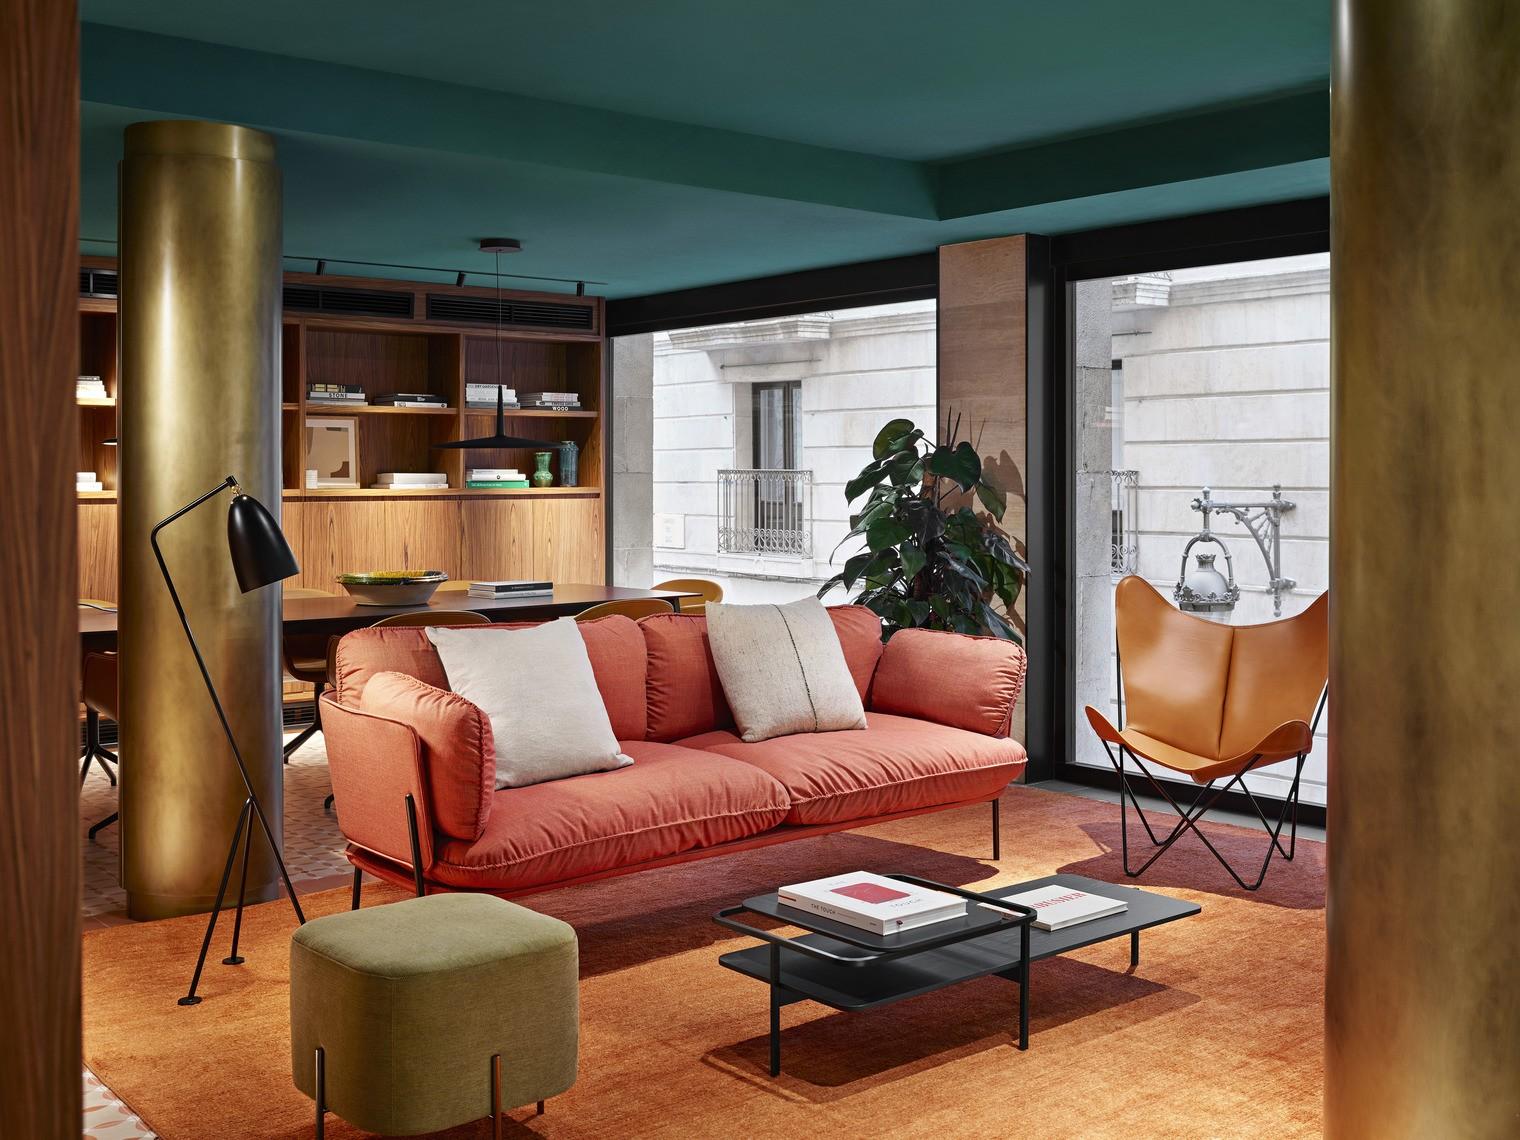 Hotel-kimpton-vividora-barcelona-el-equipo-singular-diariodesign-2-1